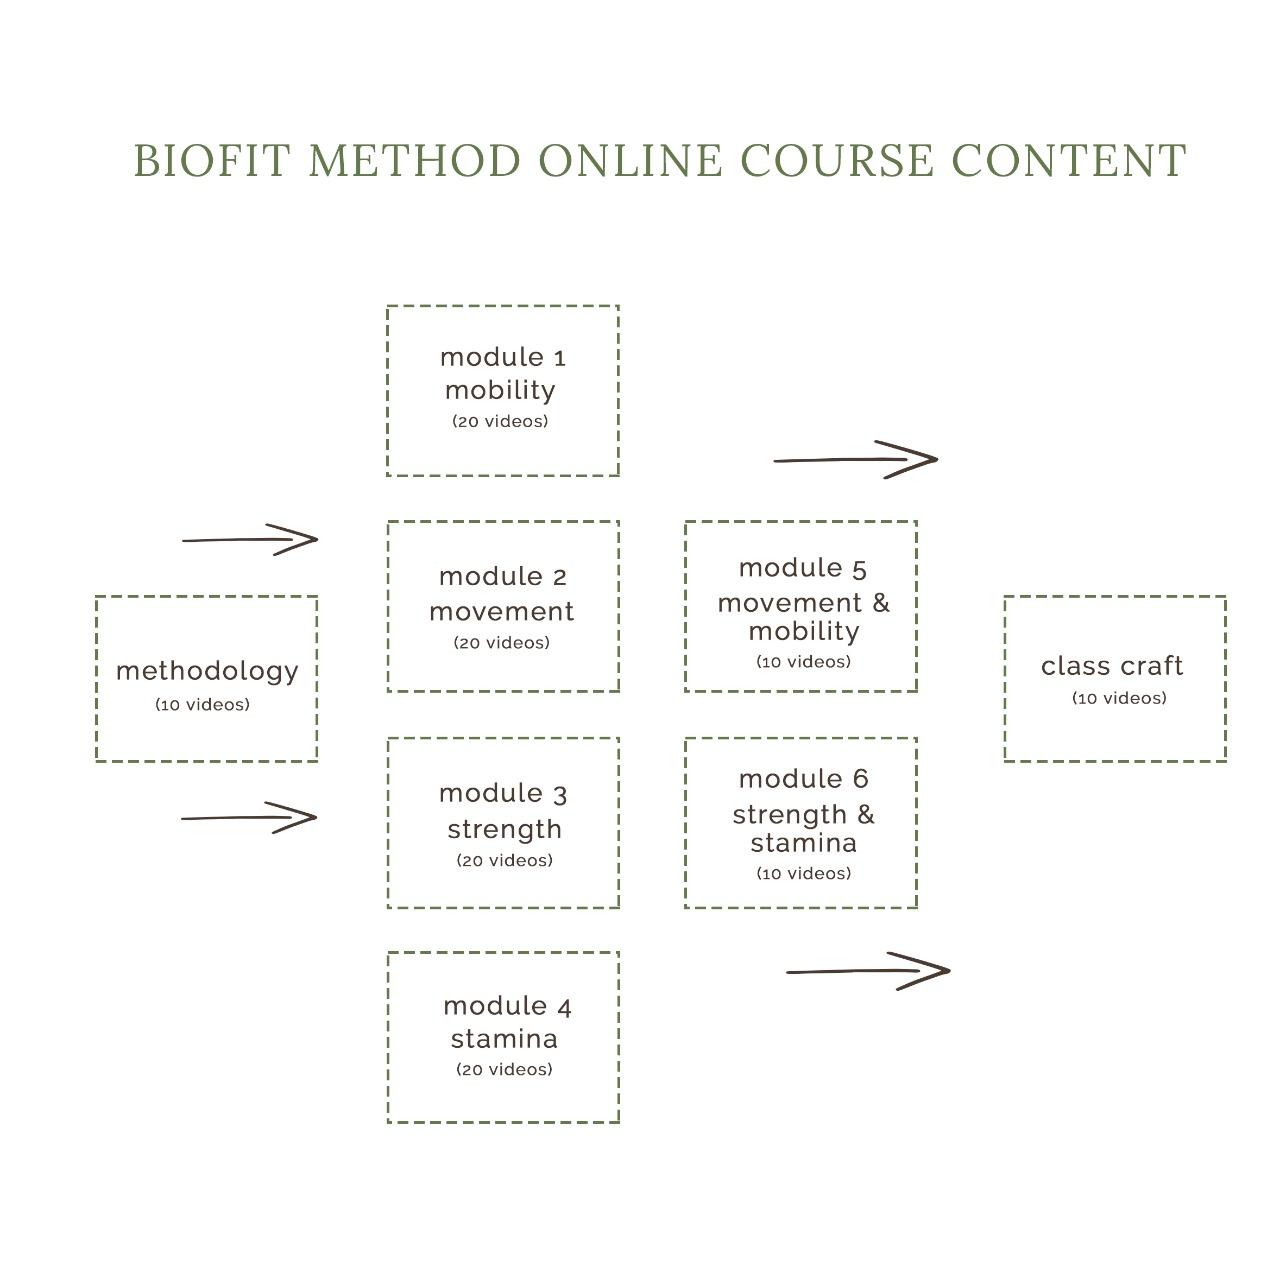 biofit method course content.jpg